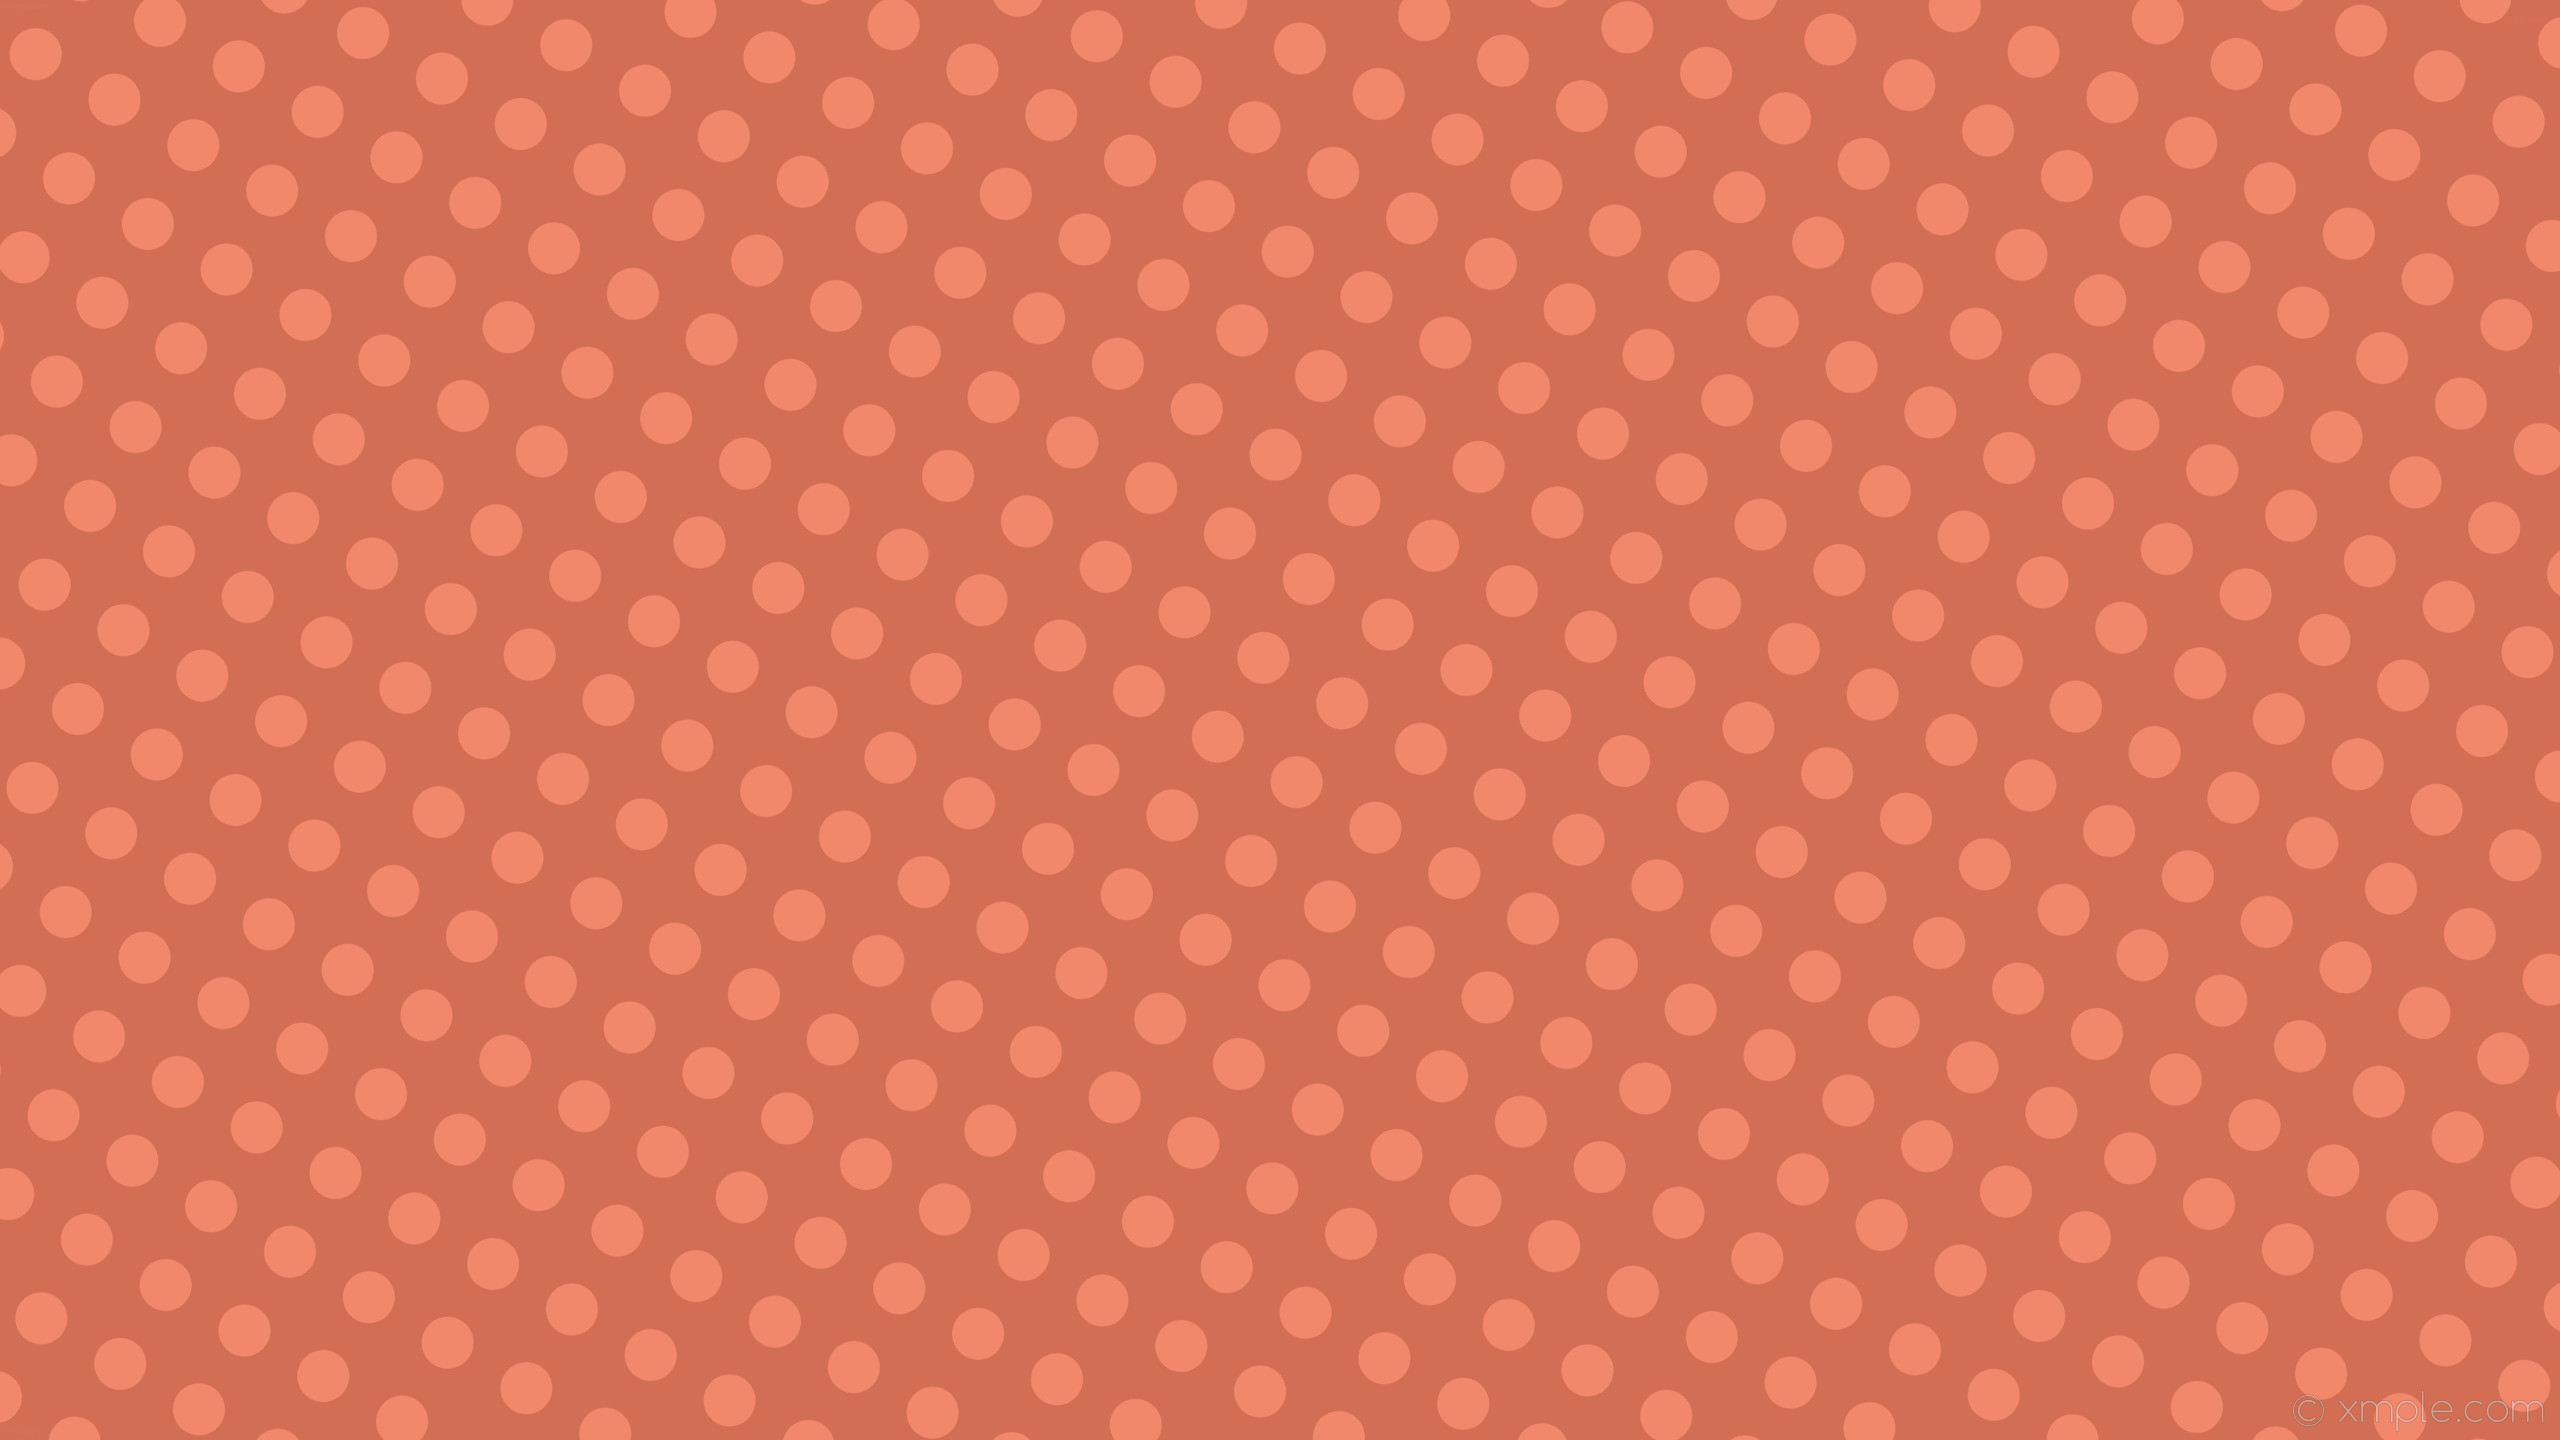 wallpaper spots red polka dots #d26e53 #f2886b 60° 52px 91px